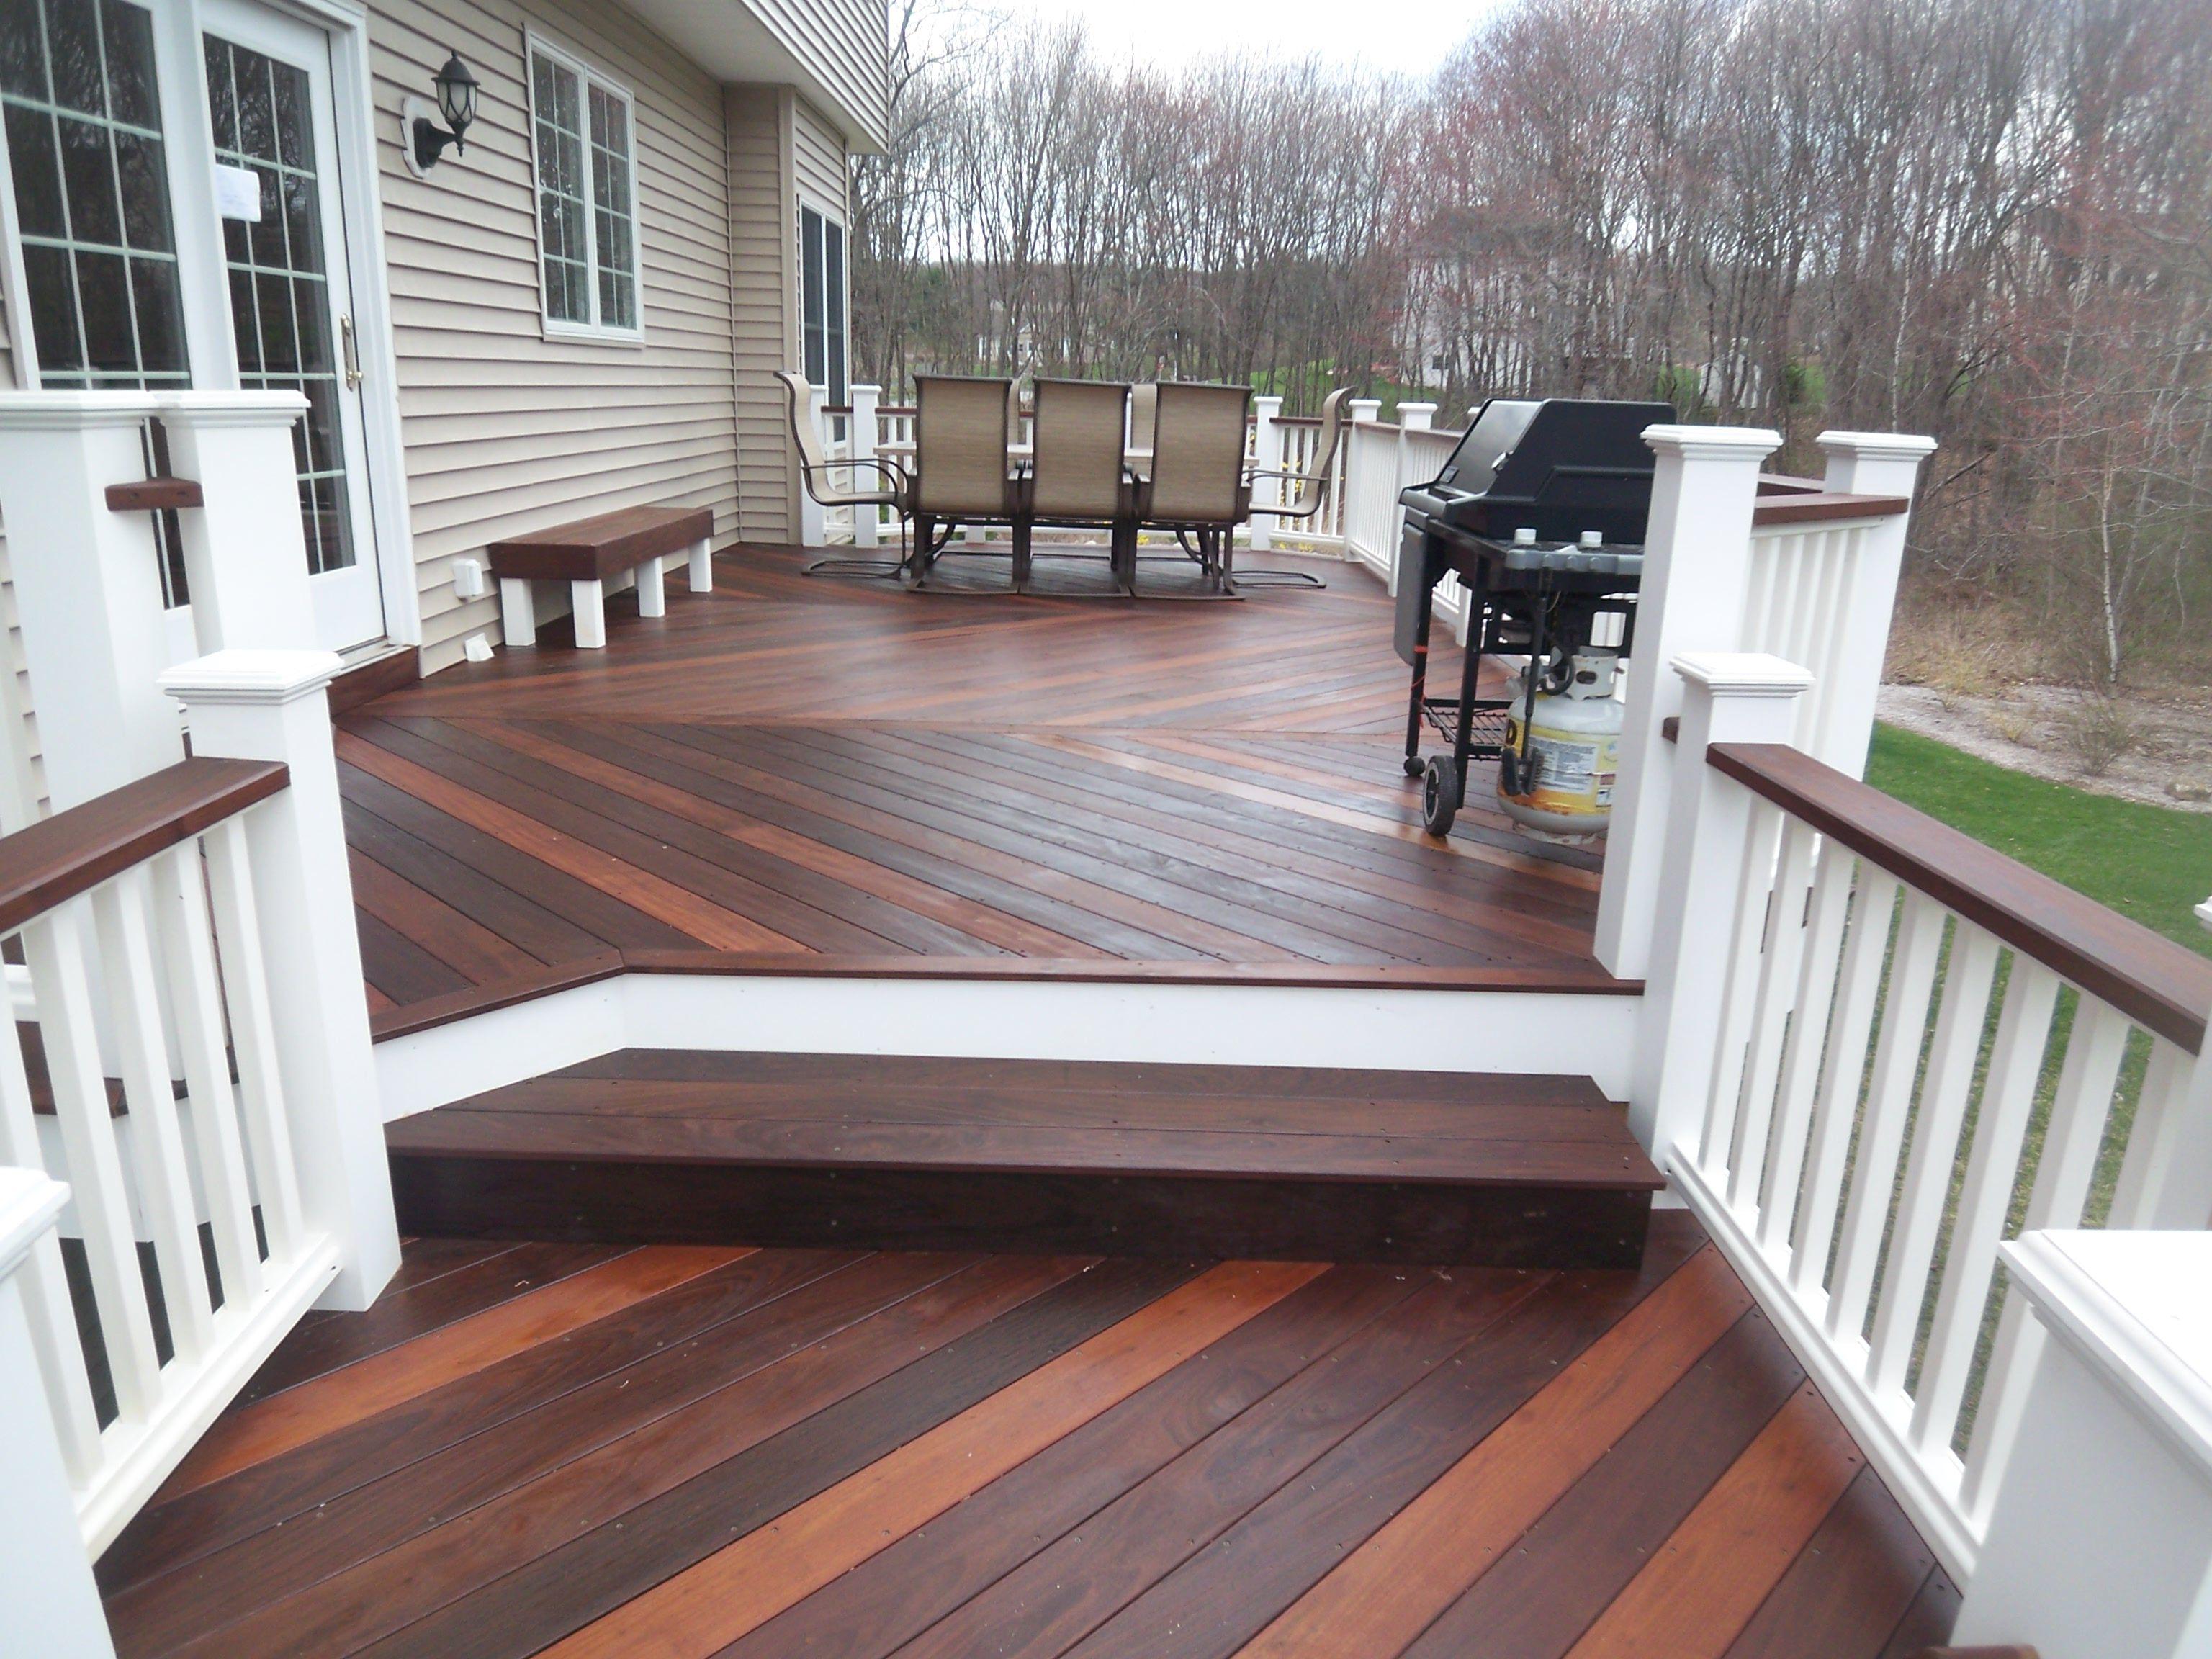 Collection Of Deck Photos Pictures Deck Specialists Inc Backyard Patio Designs Terrace Design Decks Backyard